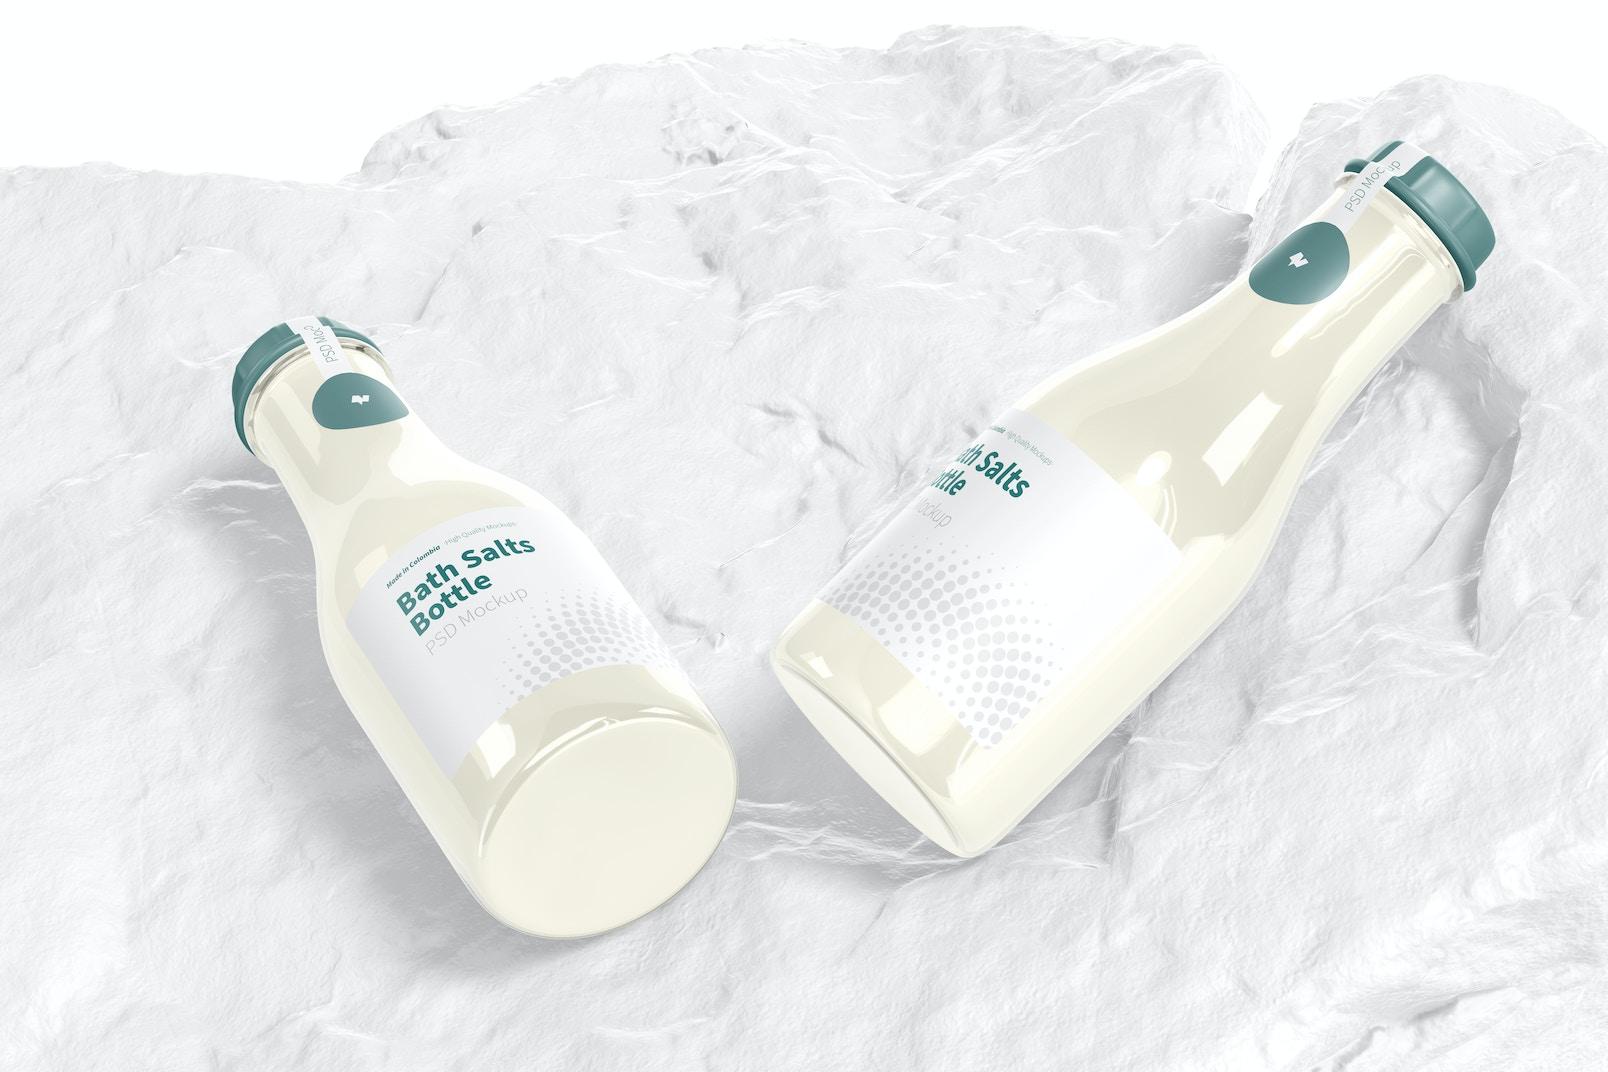 Bath Salts Bottles Mockup, Top View